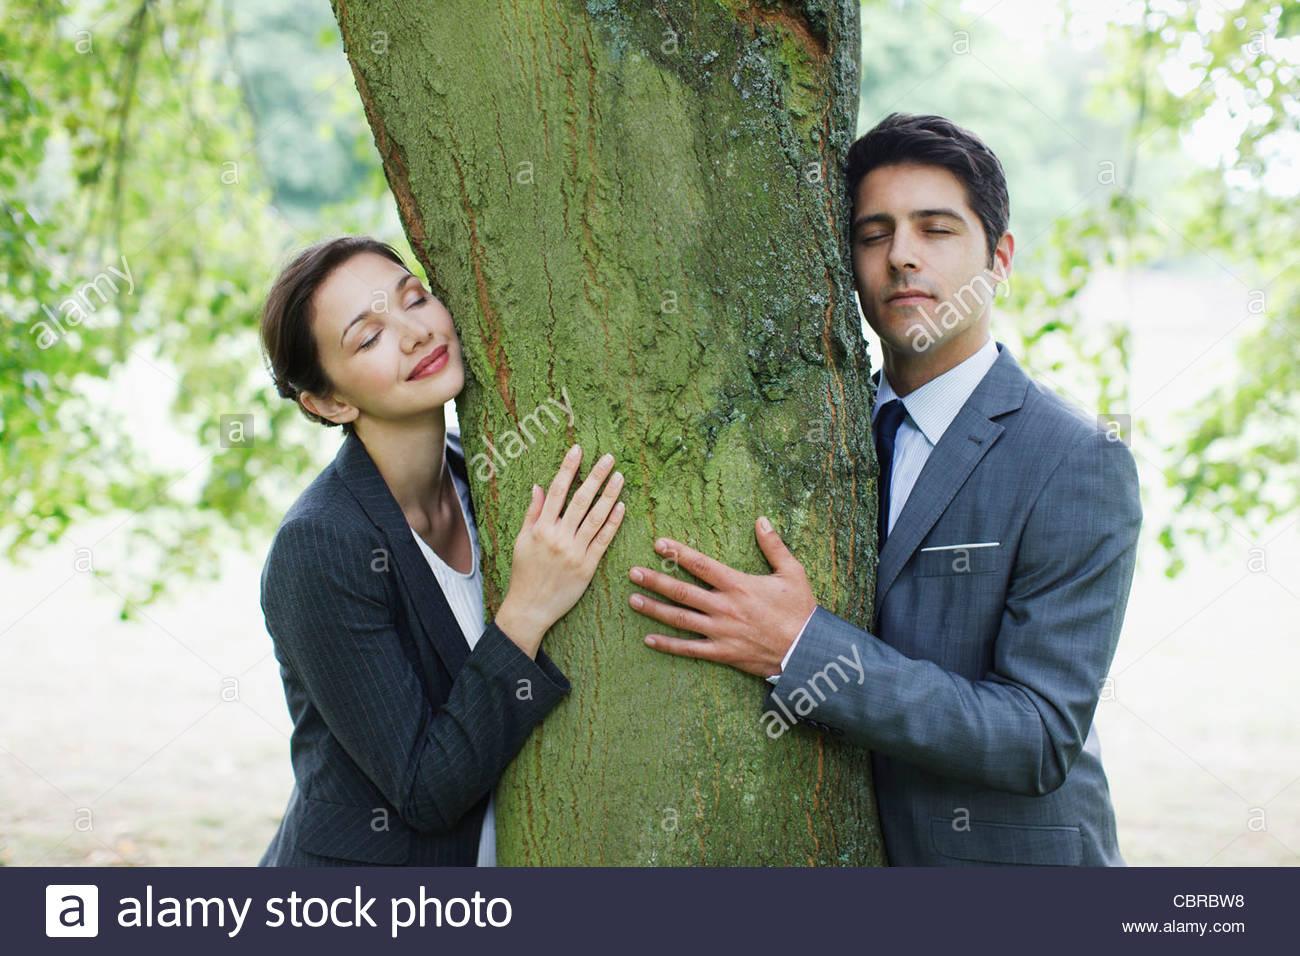 business people hugging tree stock photo 41696180 alamy